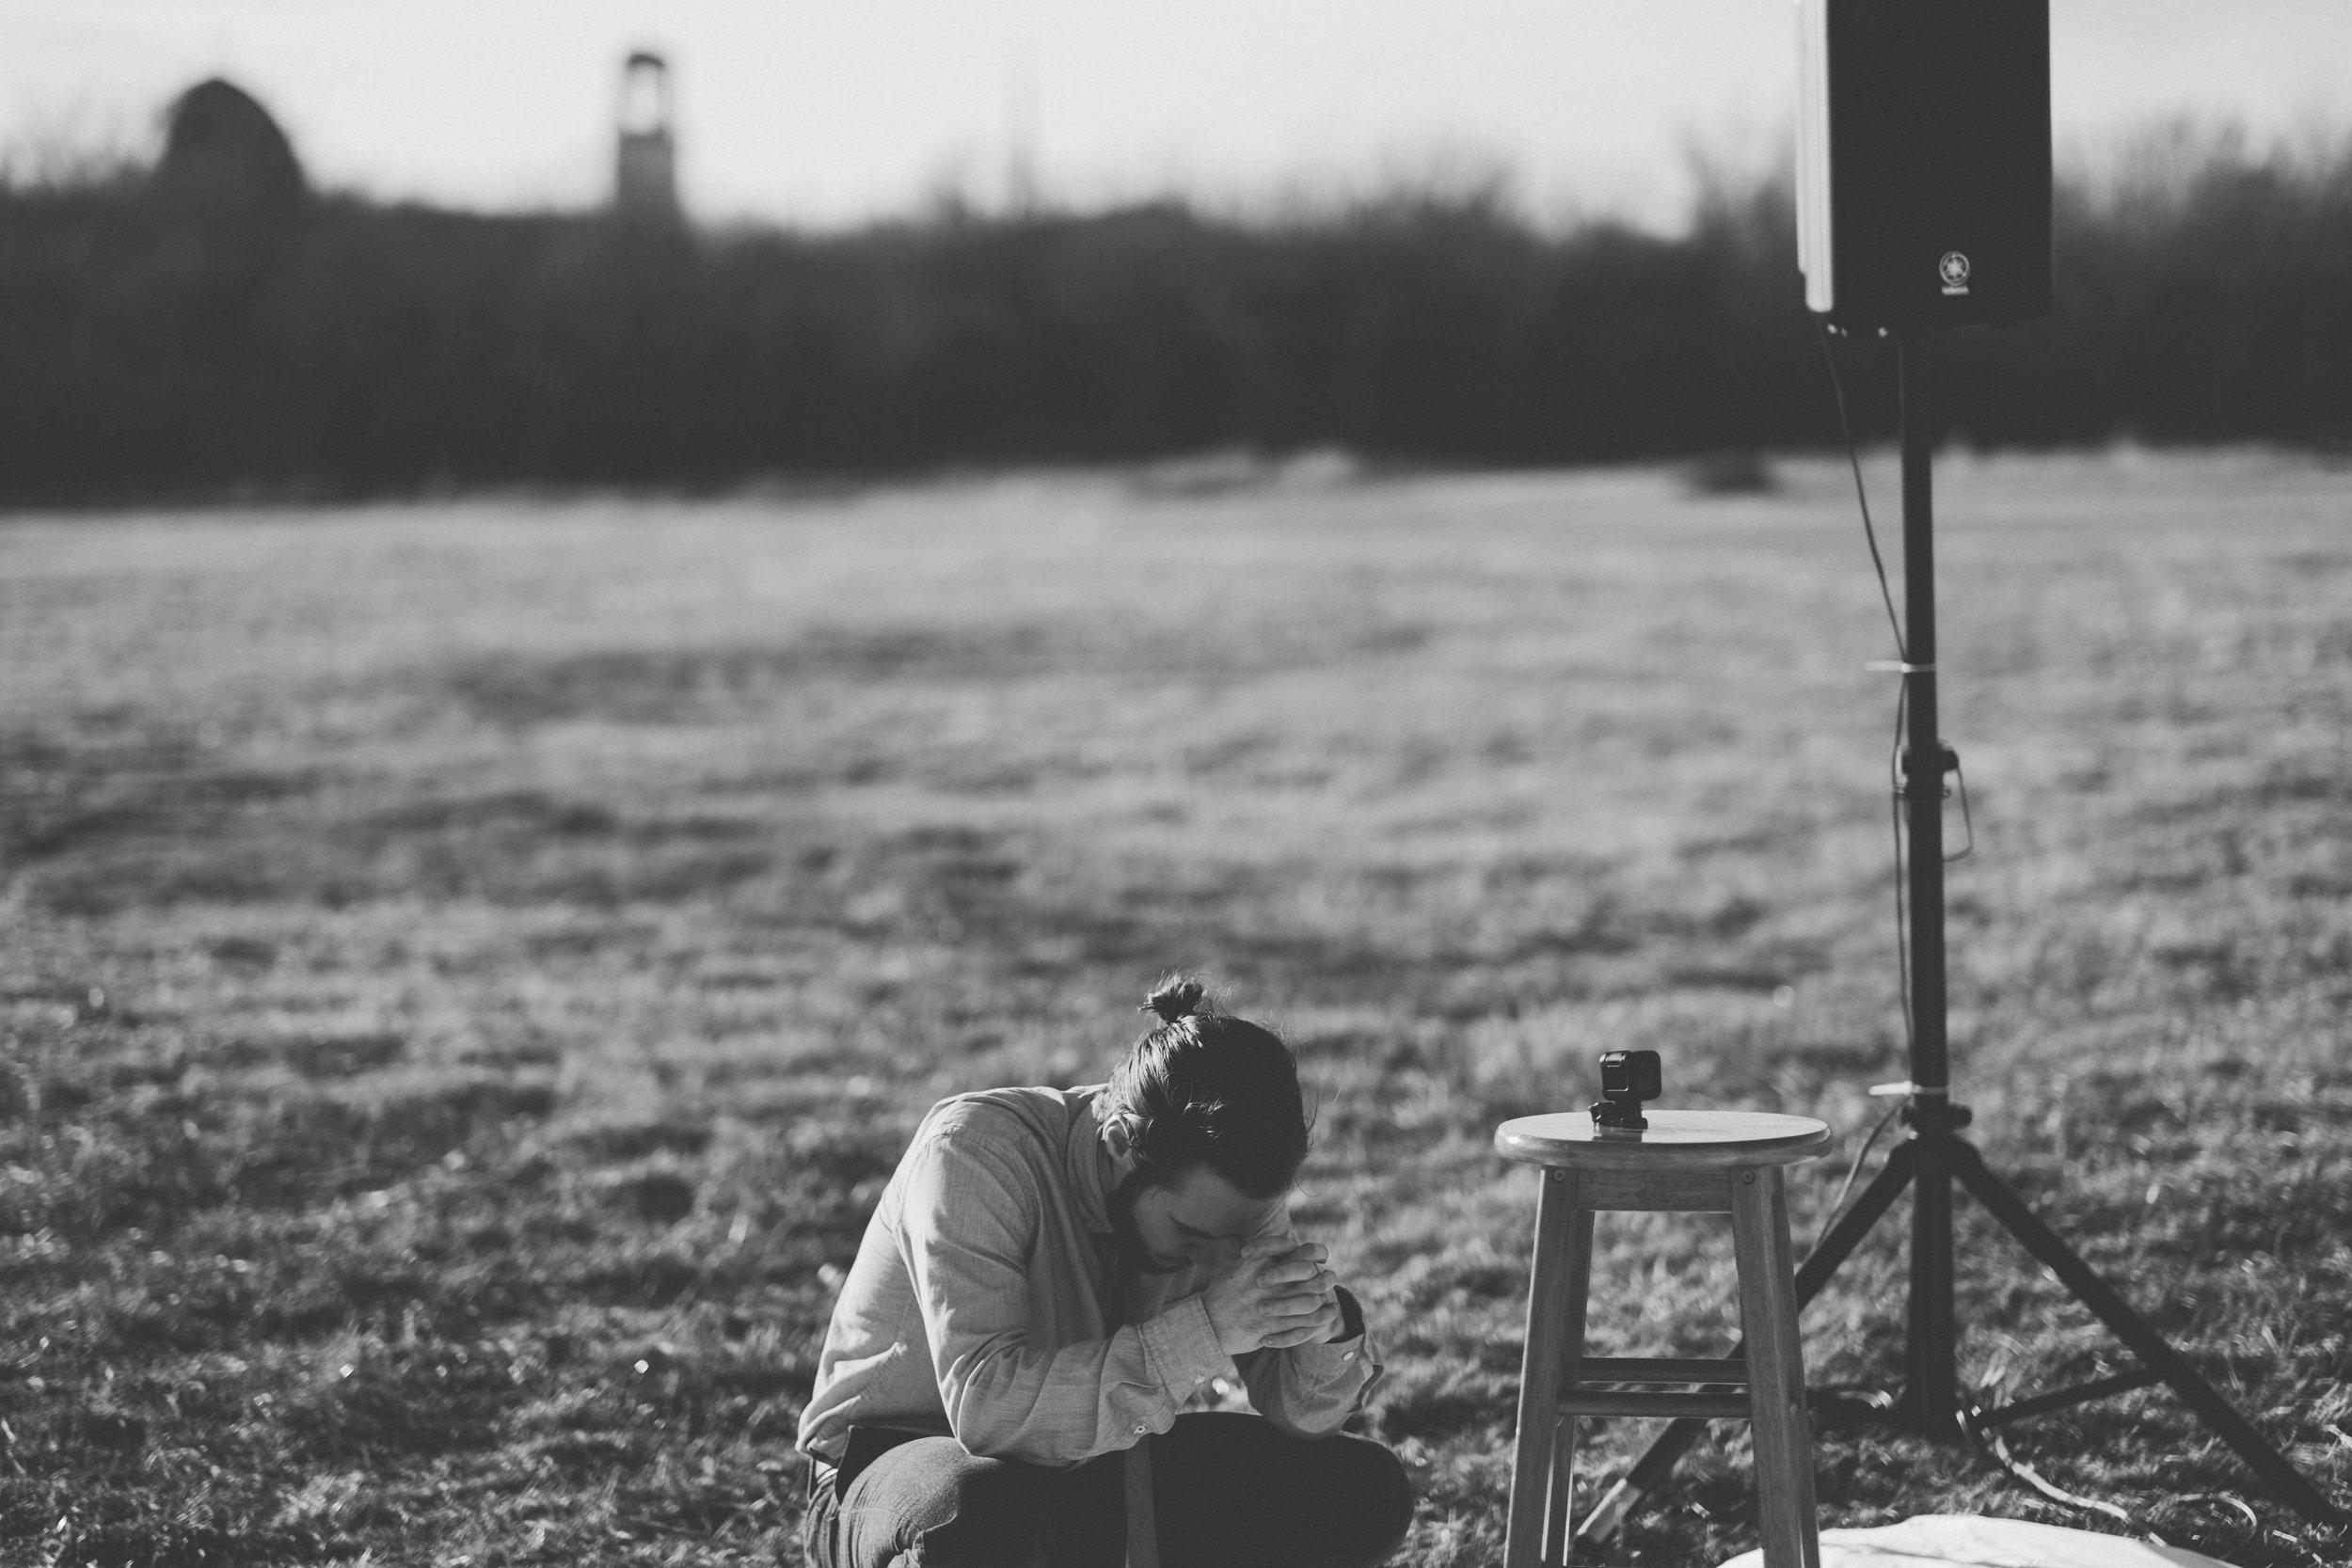 Man kneeling in prayer hands clasped together